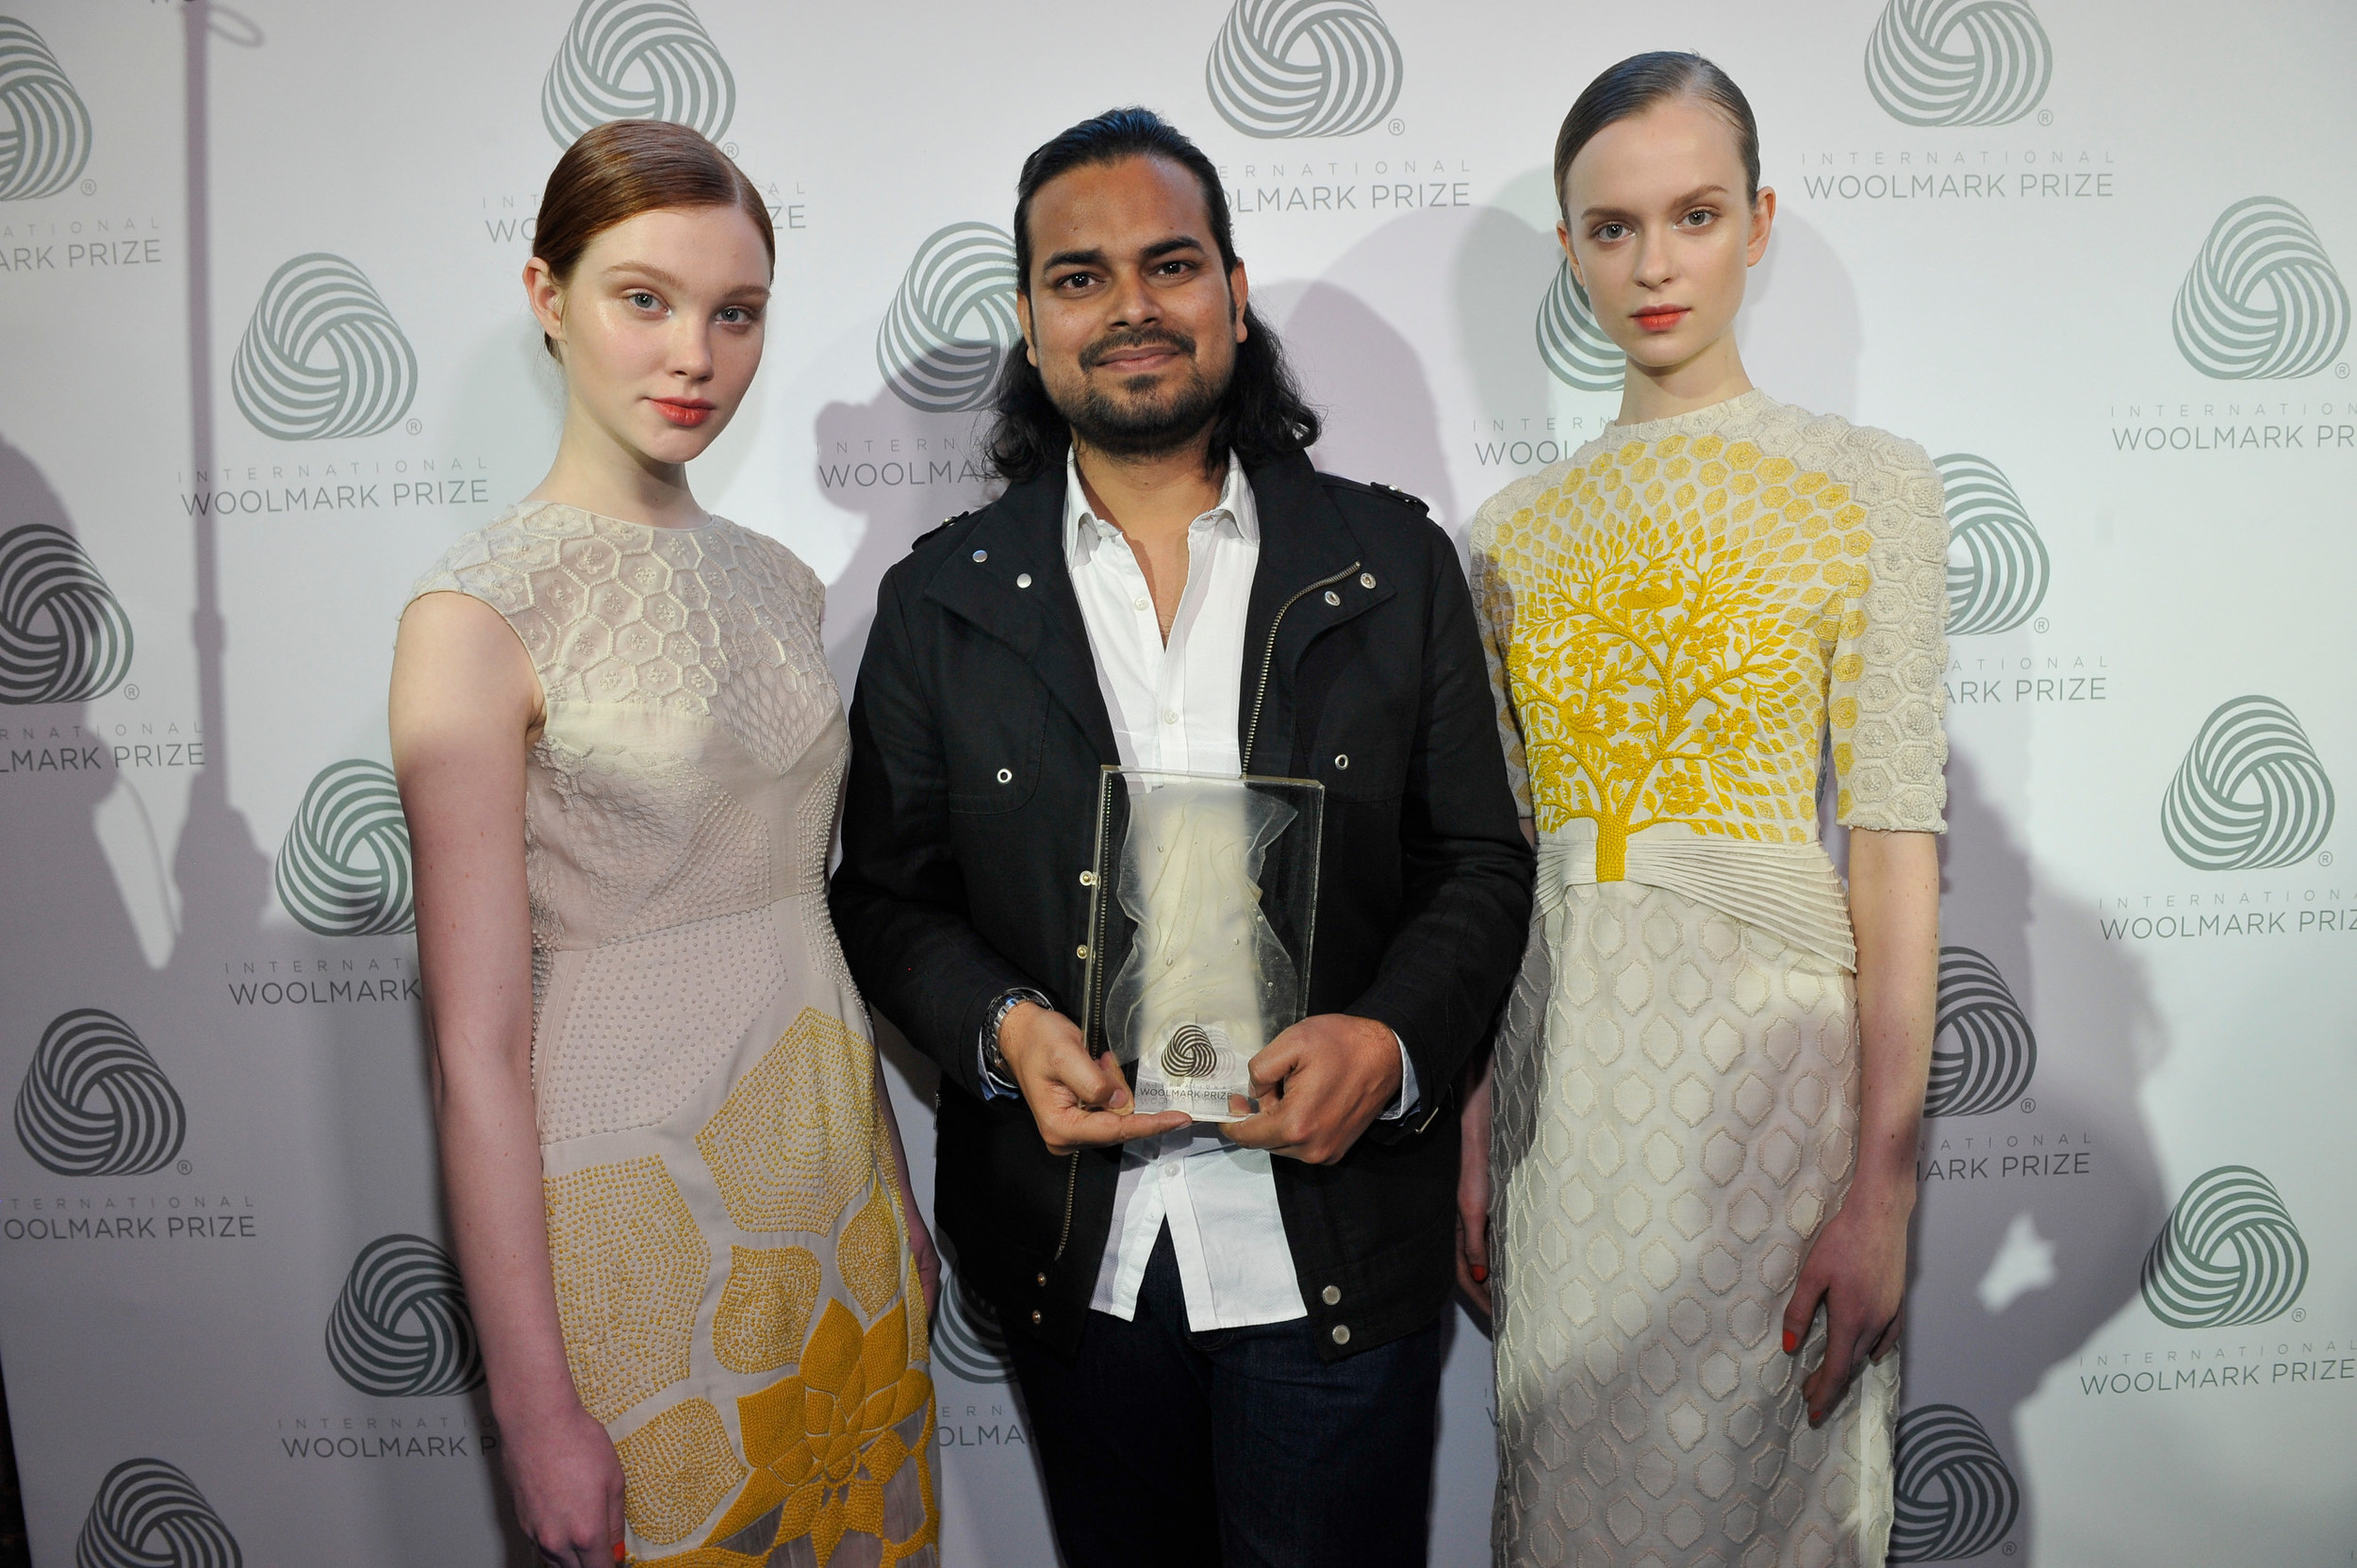 rahul-misra-wool-mark-prize-03.JPG